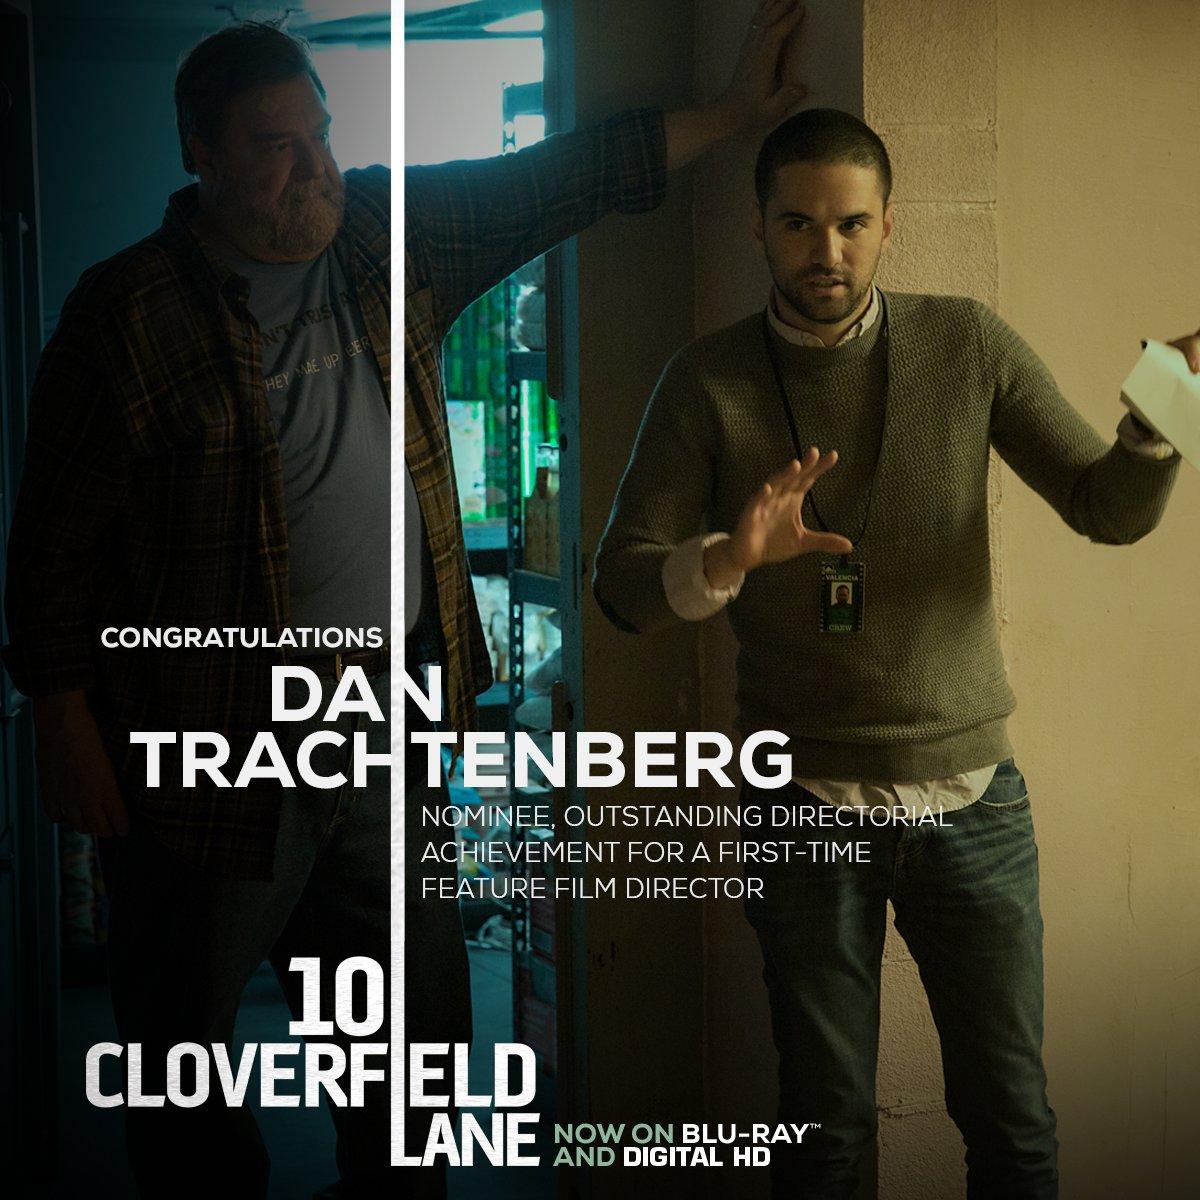 10 Cloverfield Lane 10cloverfieldln Twitter Directors Guild America Recognized Dannytrs